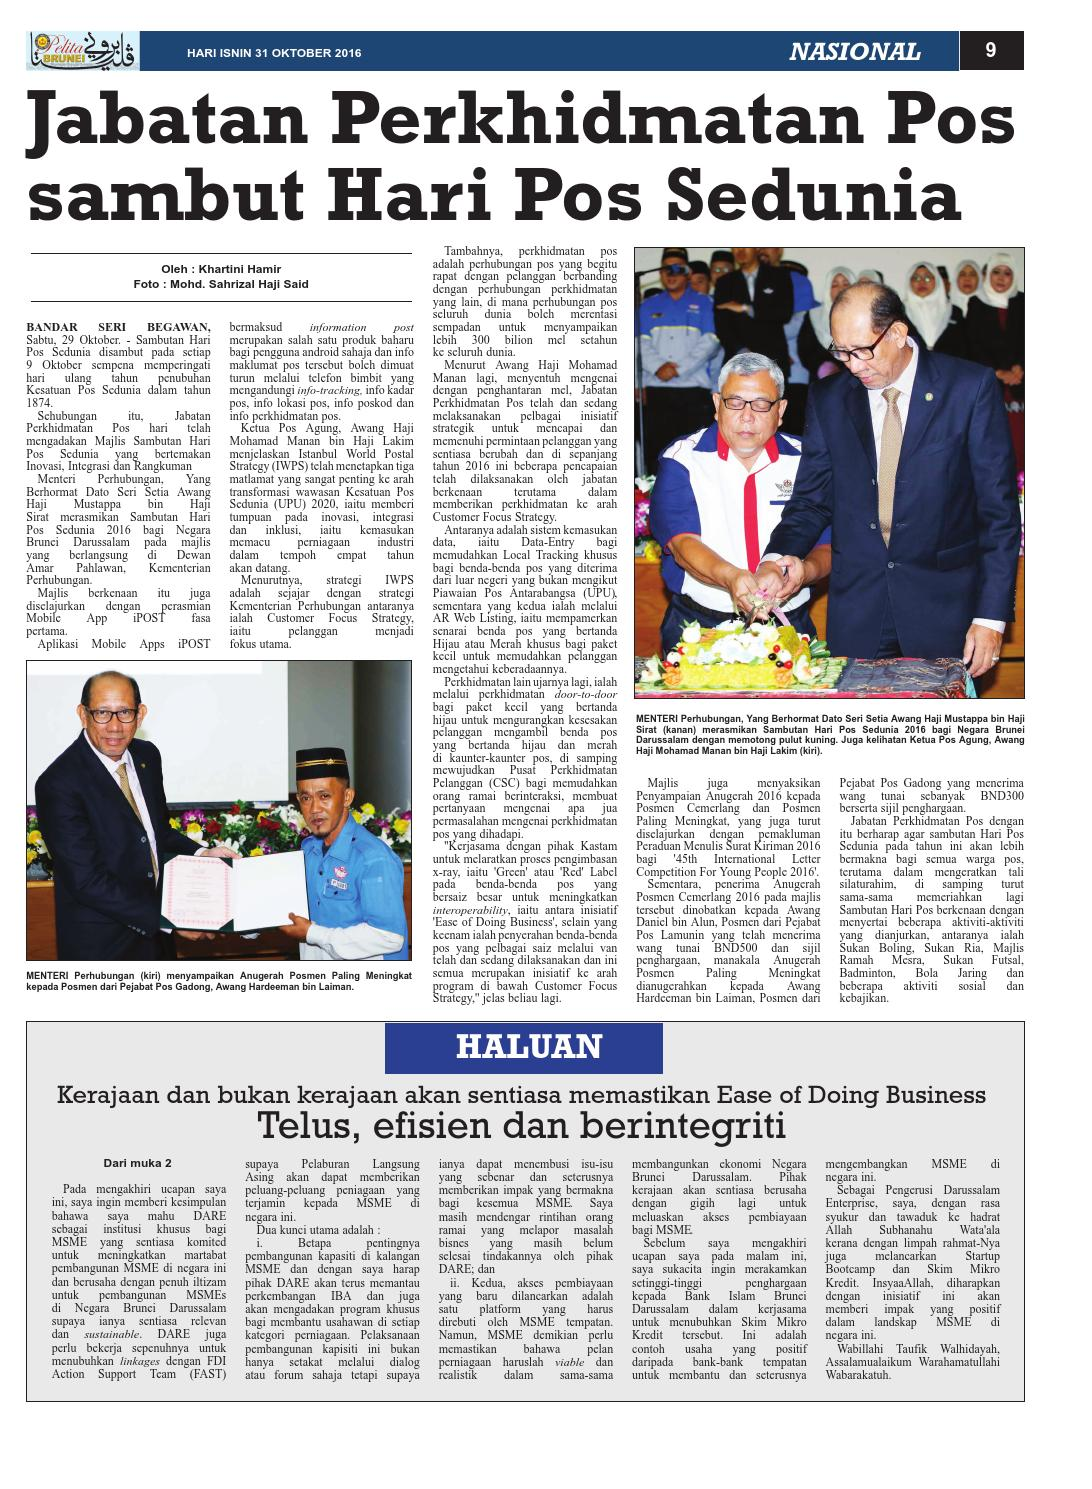 Pelita Brunei - Isnin 31 Okt 2016 by Putera Katak Brunei - issuu